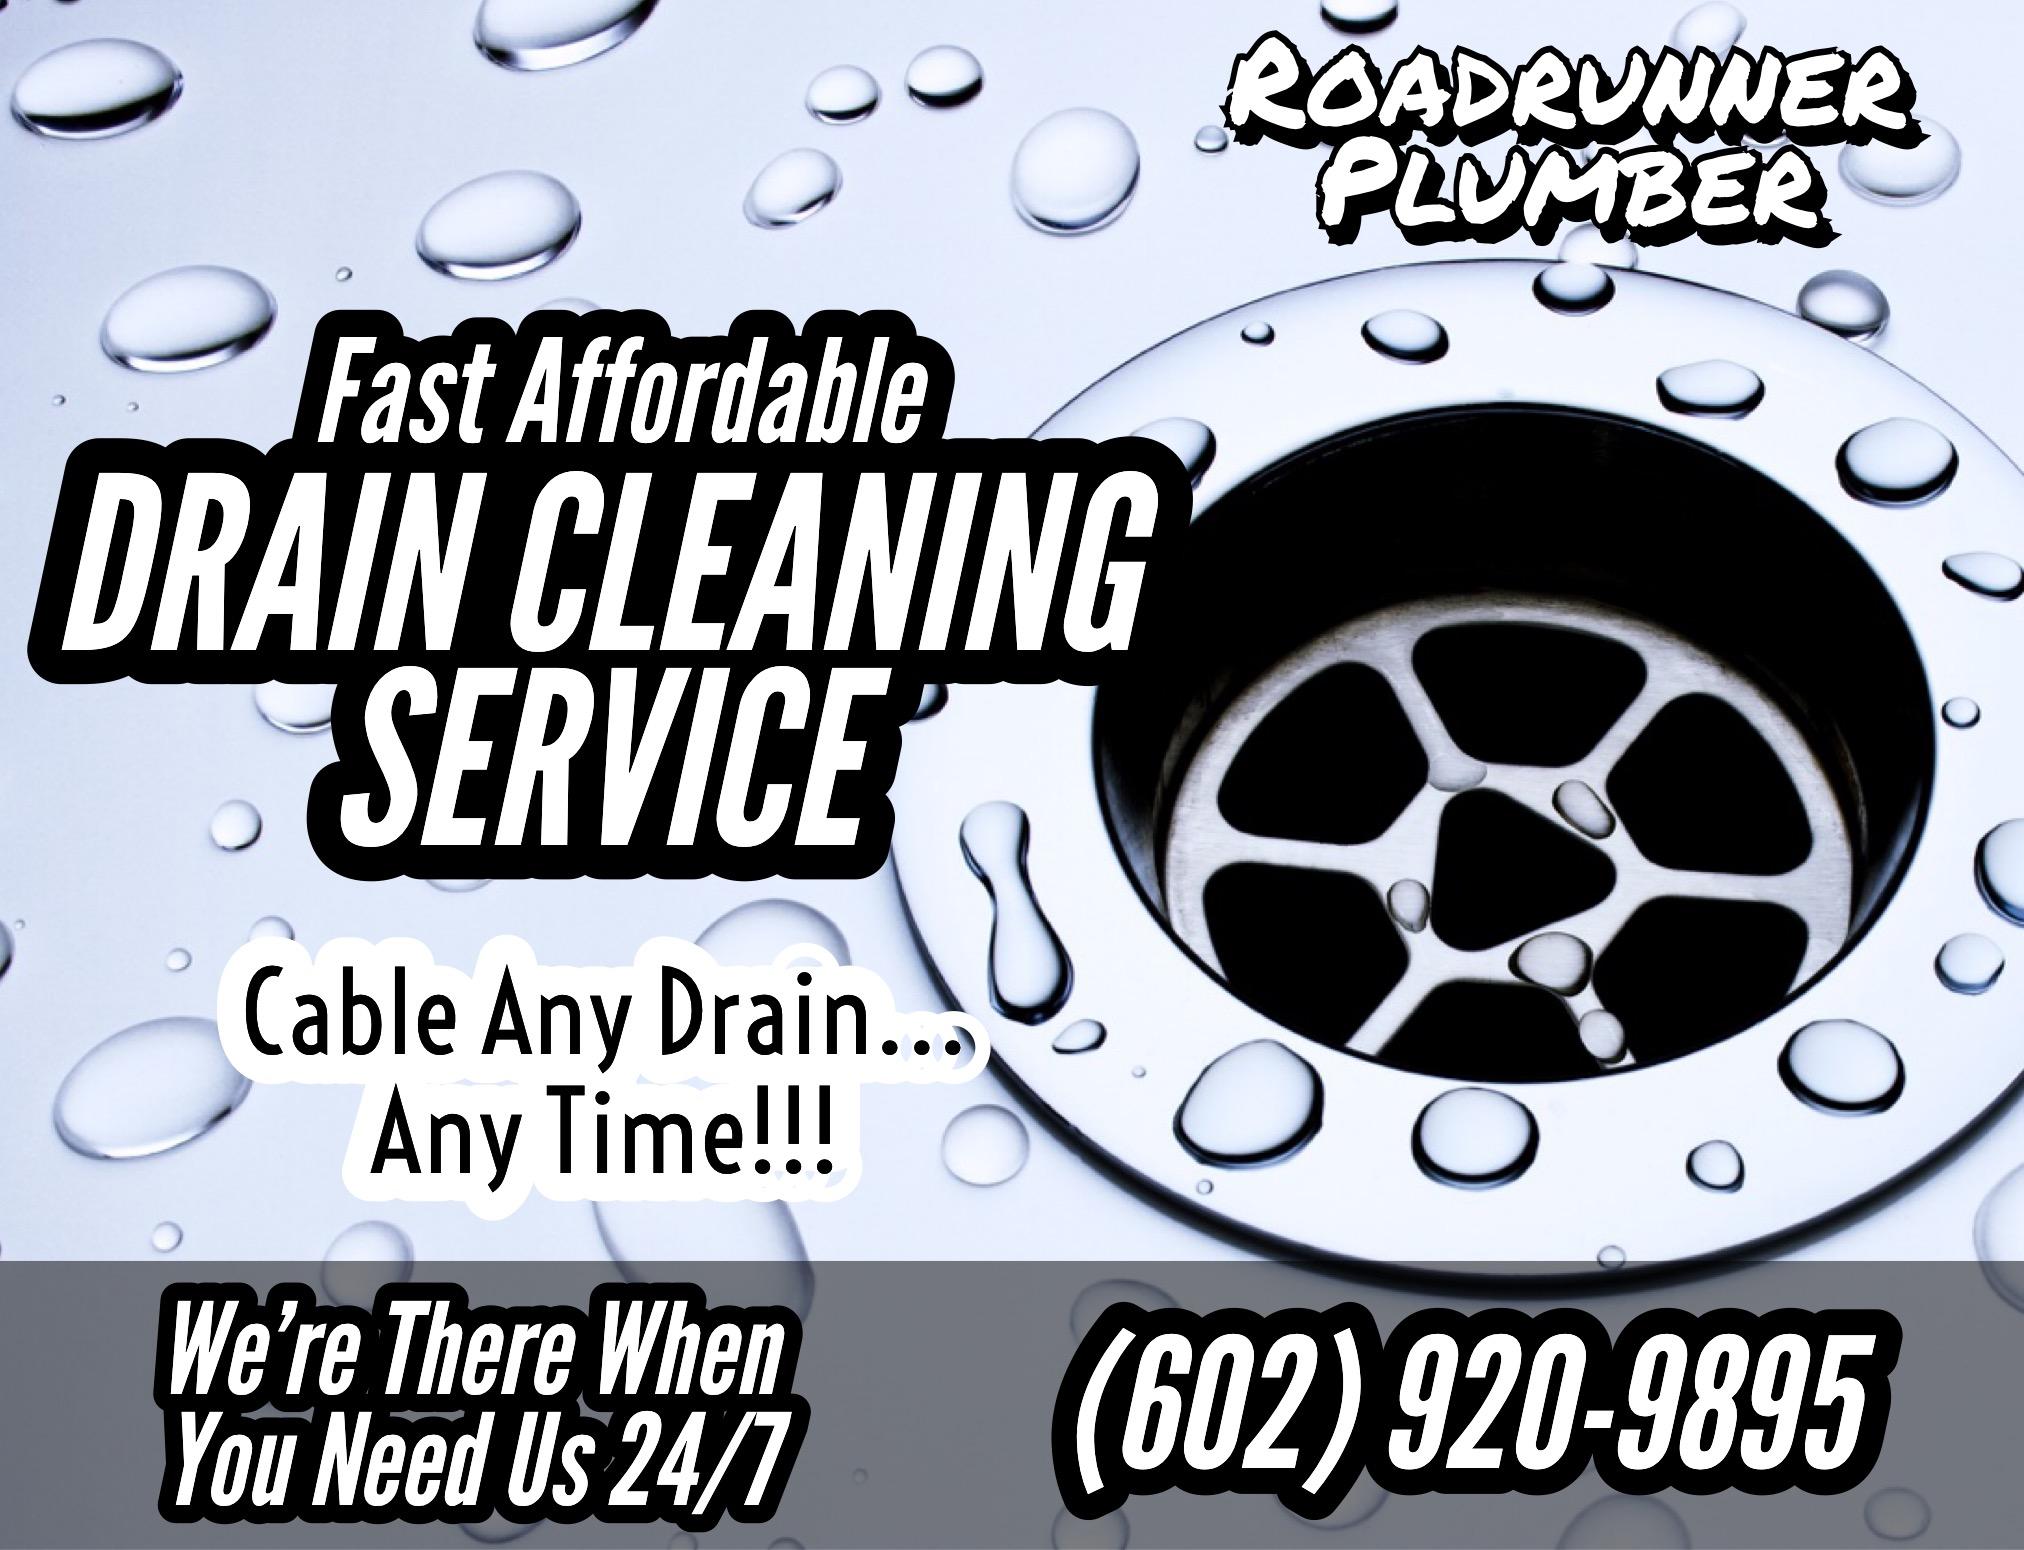 Roadrunner Plumber ☑ Drain Cleaning Service ☑ 24/7 Plumbing